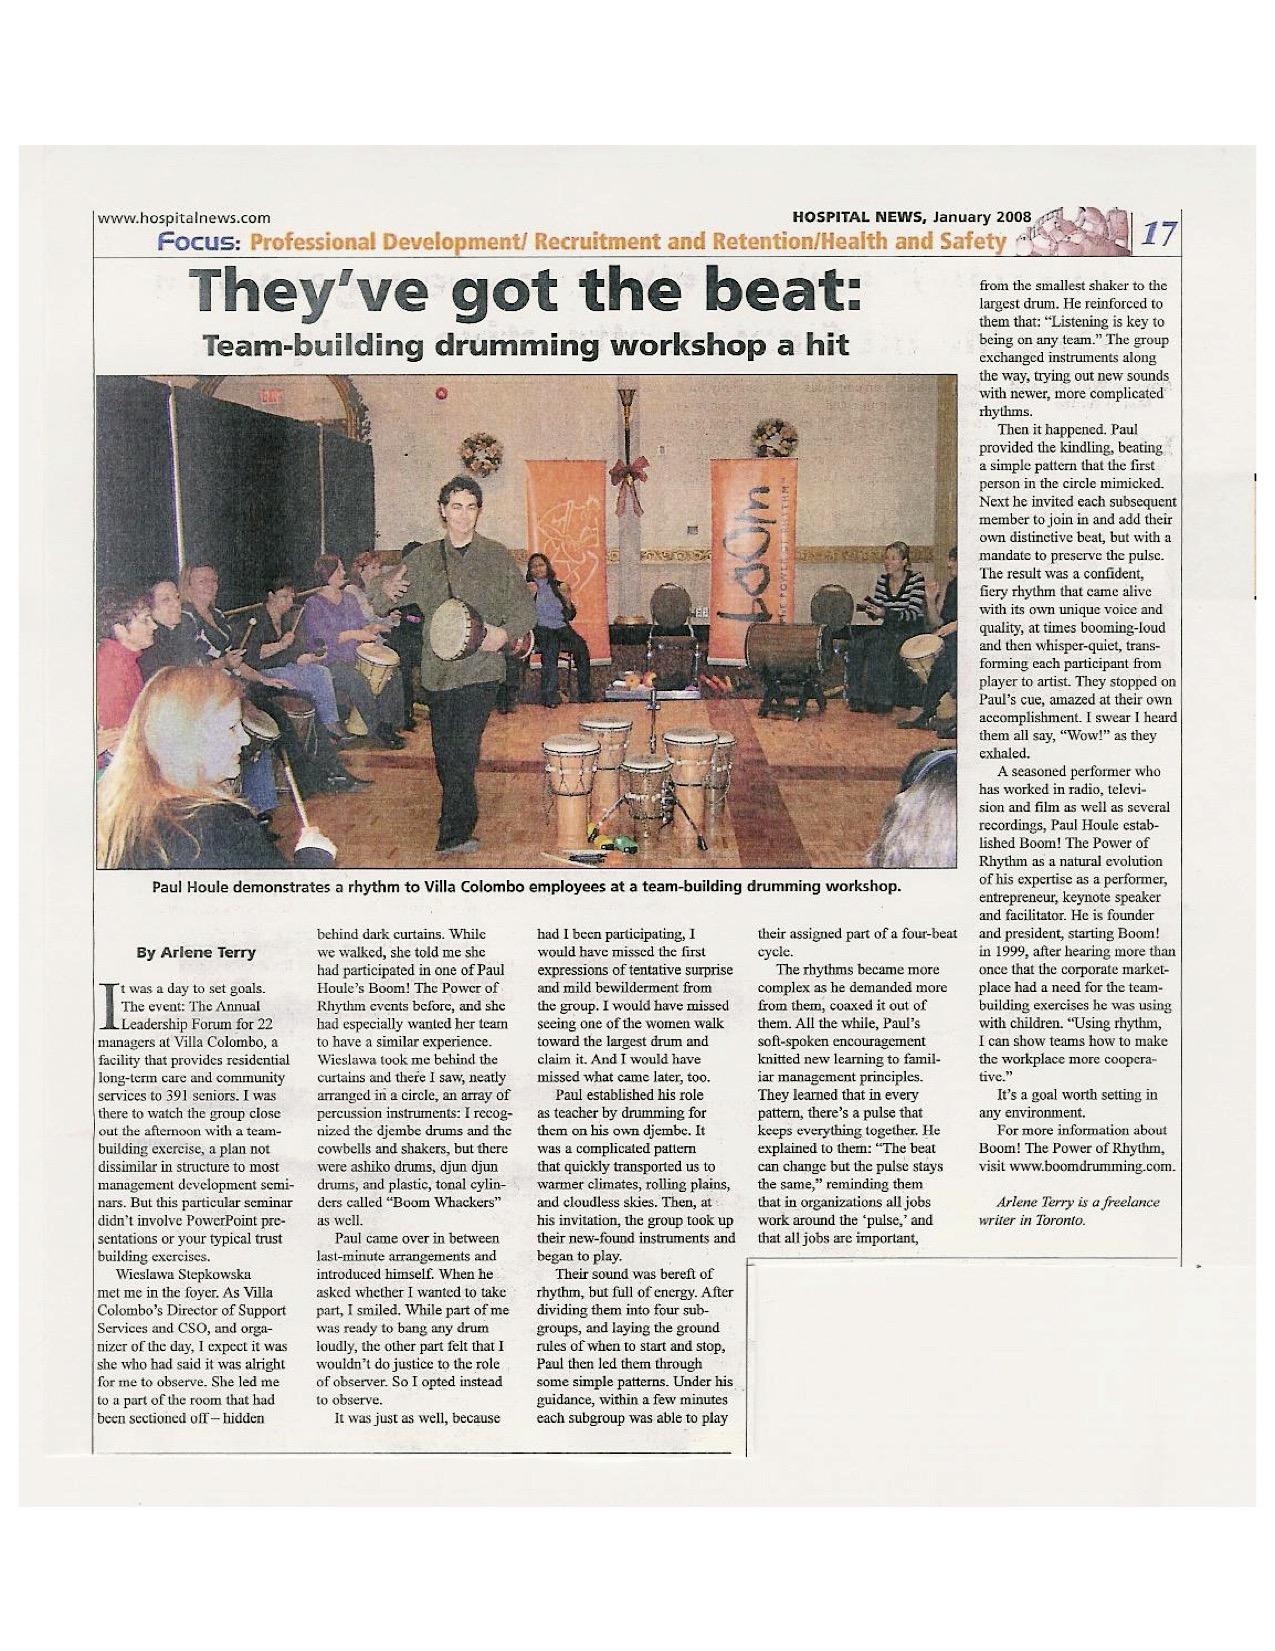 Boom! The Power of Rhythm - Paul Houle - They've Got the Beat - Hospital News copy.jpg